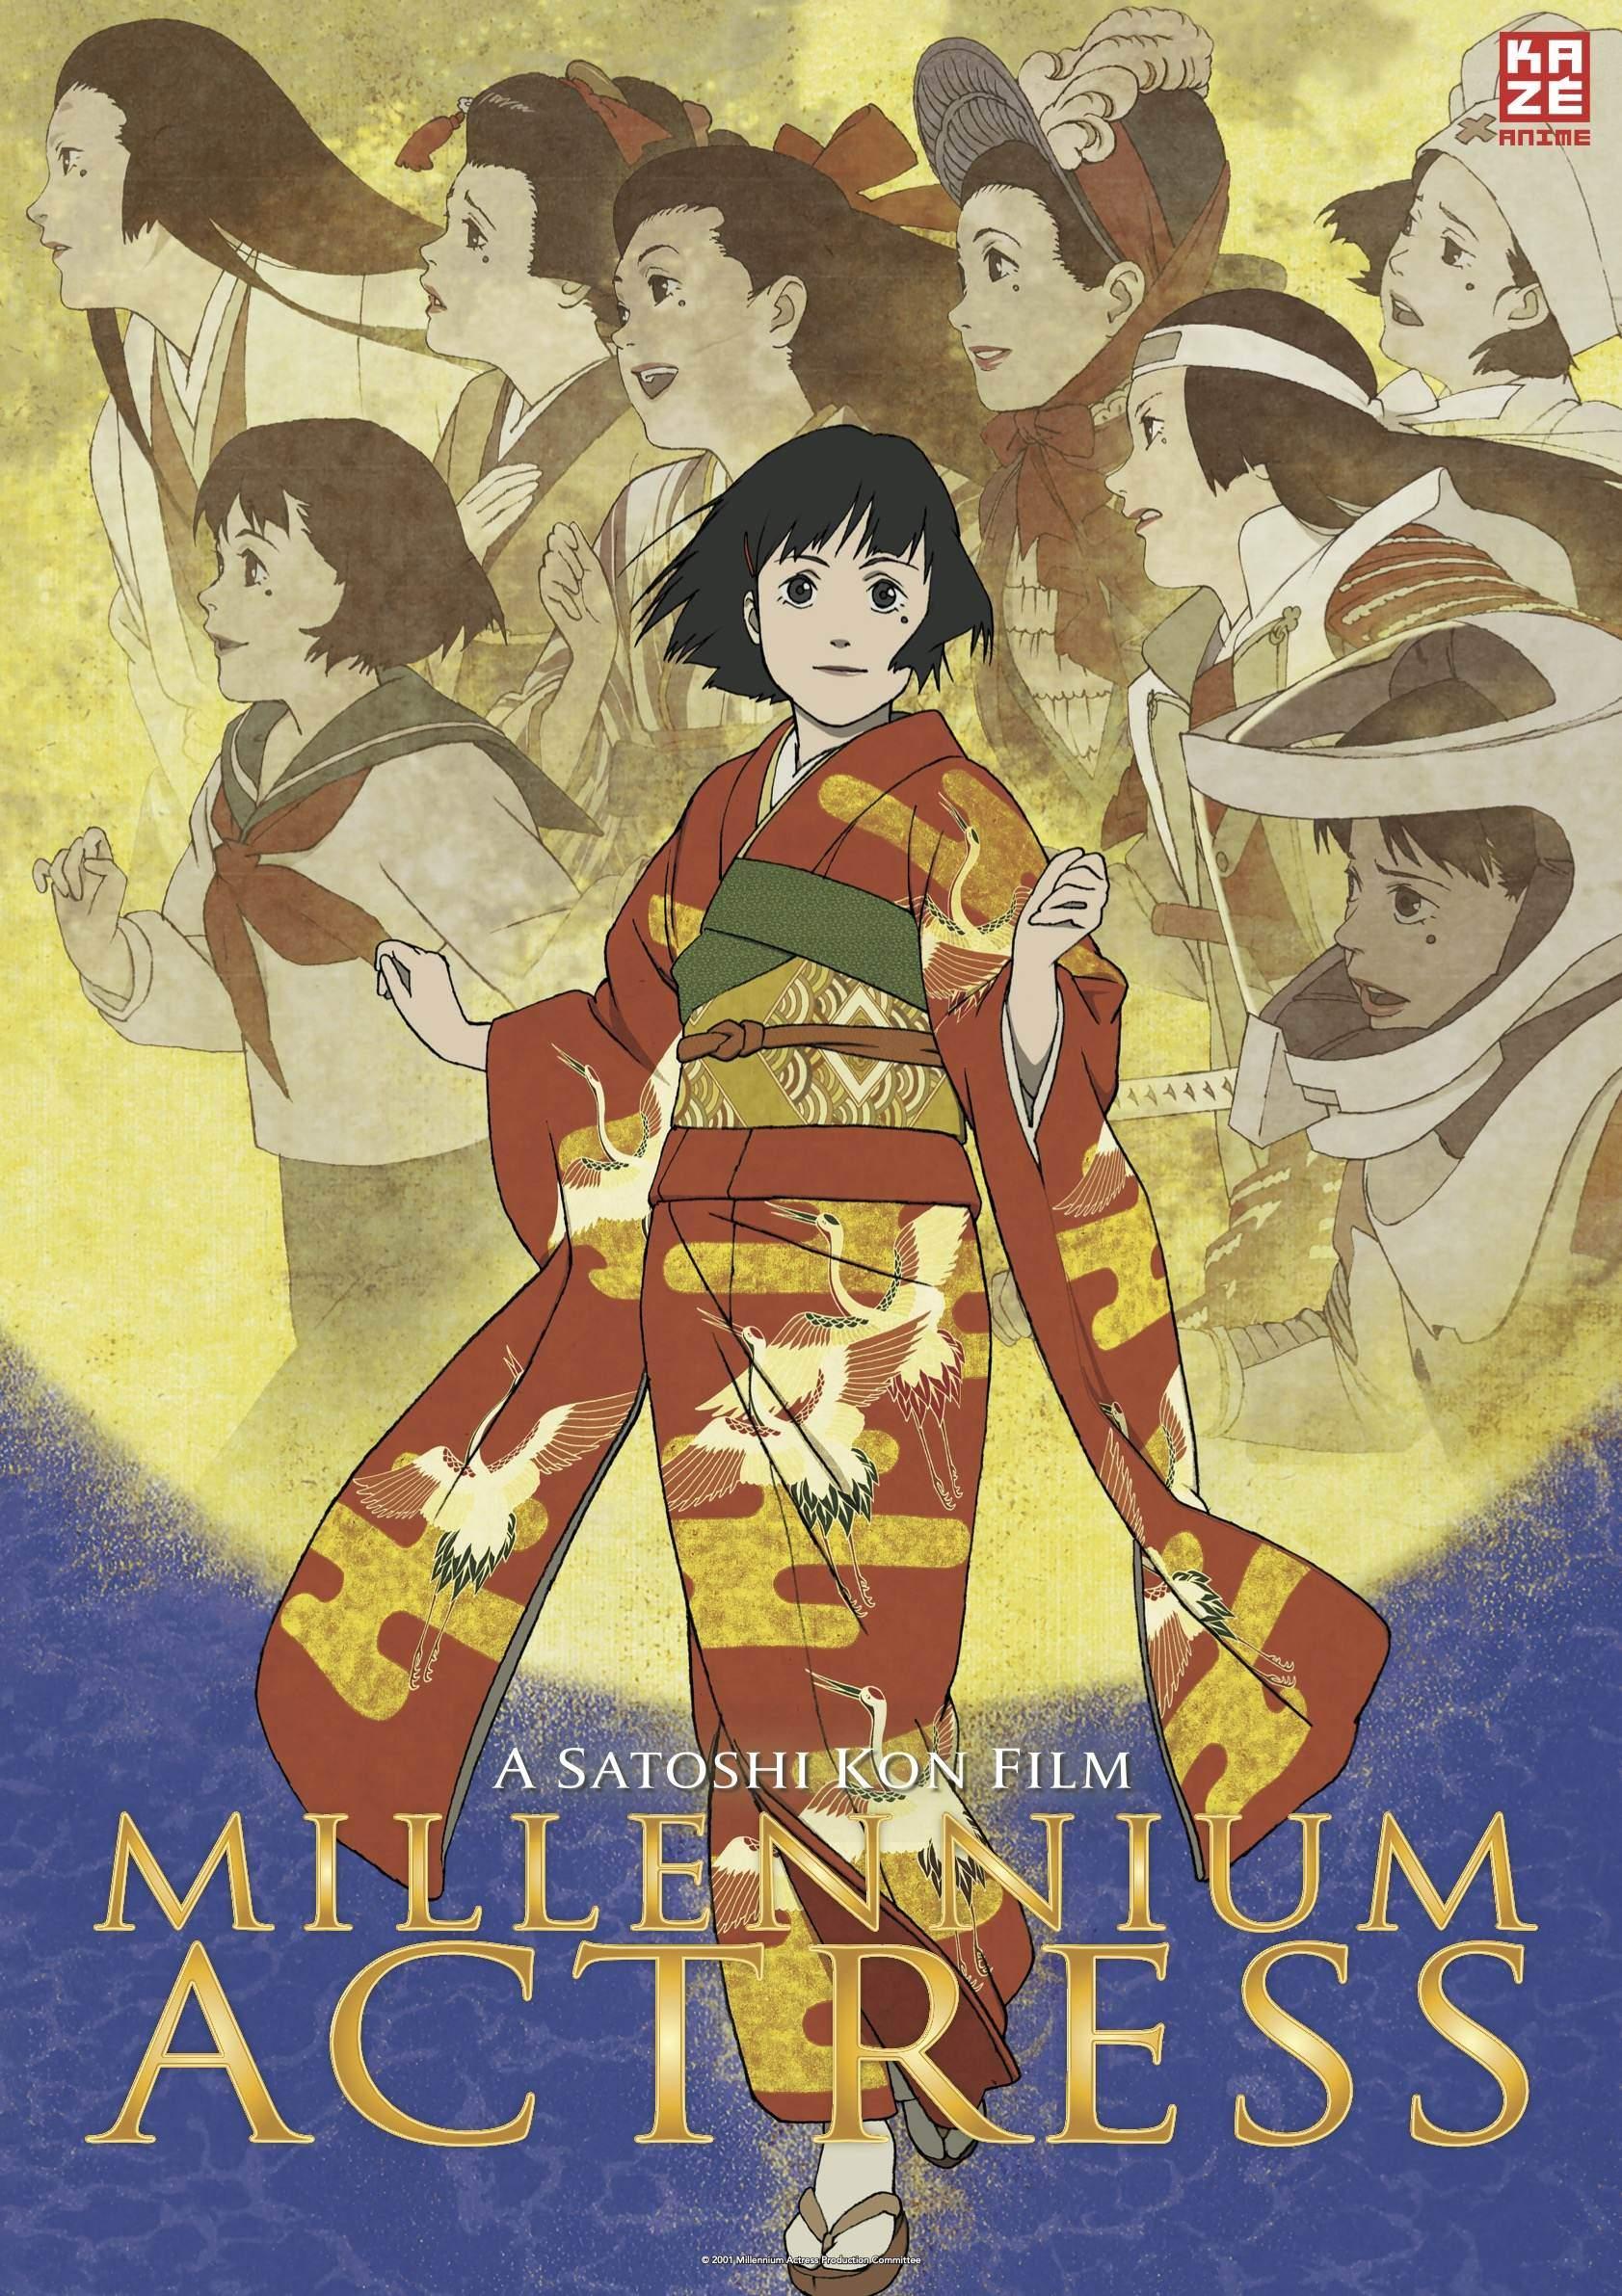 Millenium_Actress_Poster_A1-2.jpg